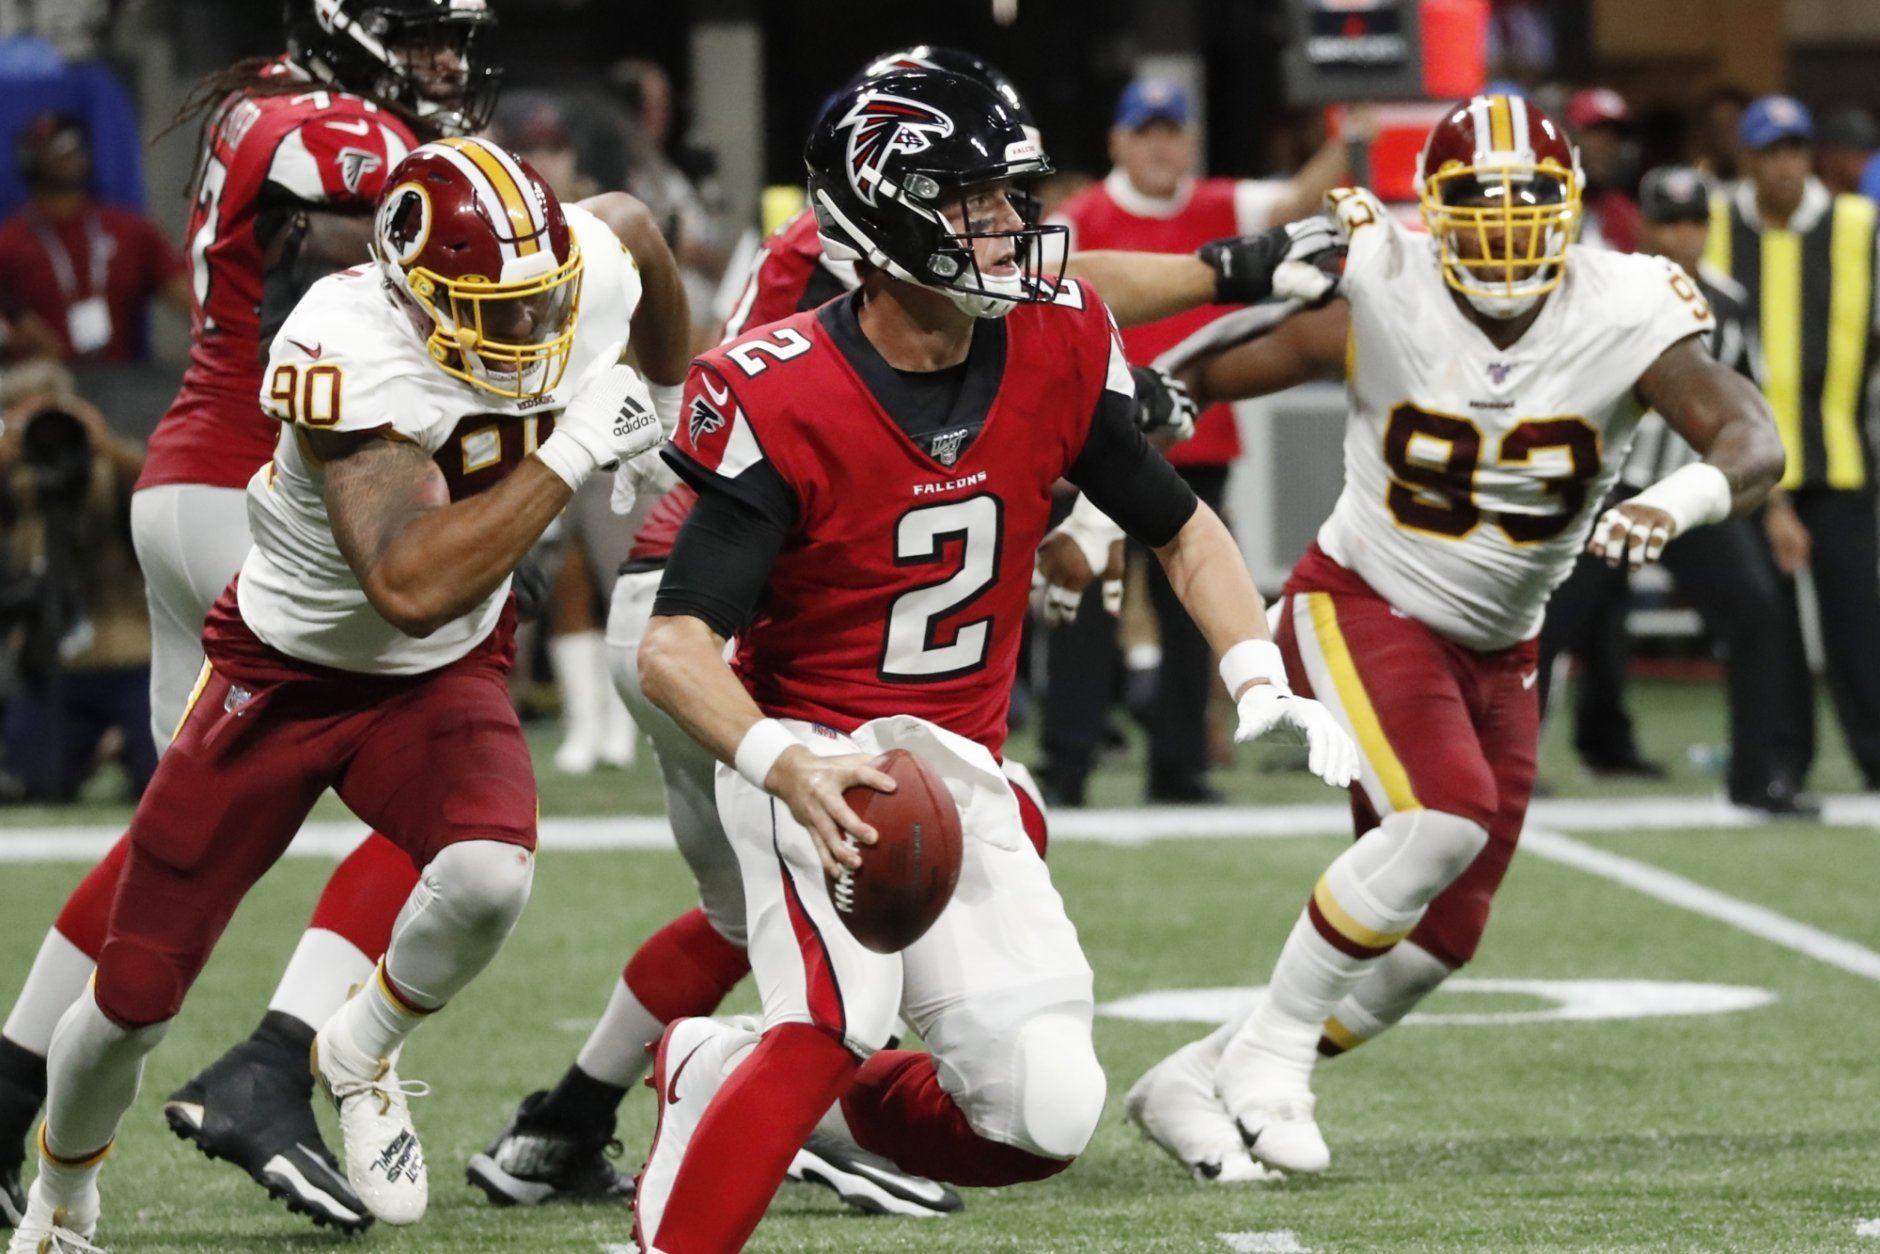 Atlanta Falcons quarterback Matt Ryan (2) runs out of the pocket against the Washington Redskins during the first half an NFL preseason football game, Thursday, Aug. 22, 2019, in Atlanta. (AP Photo/John Bazemore)